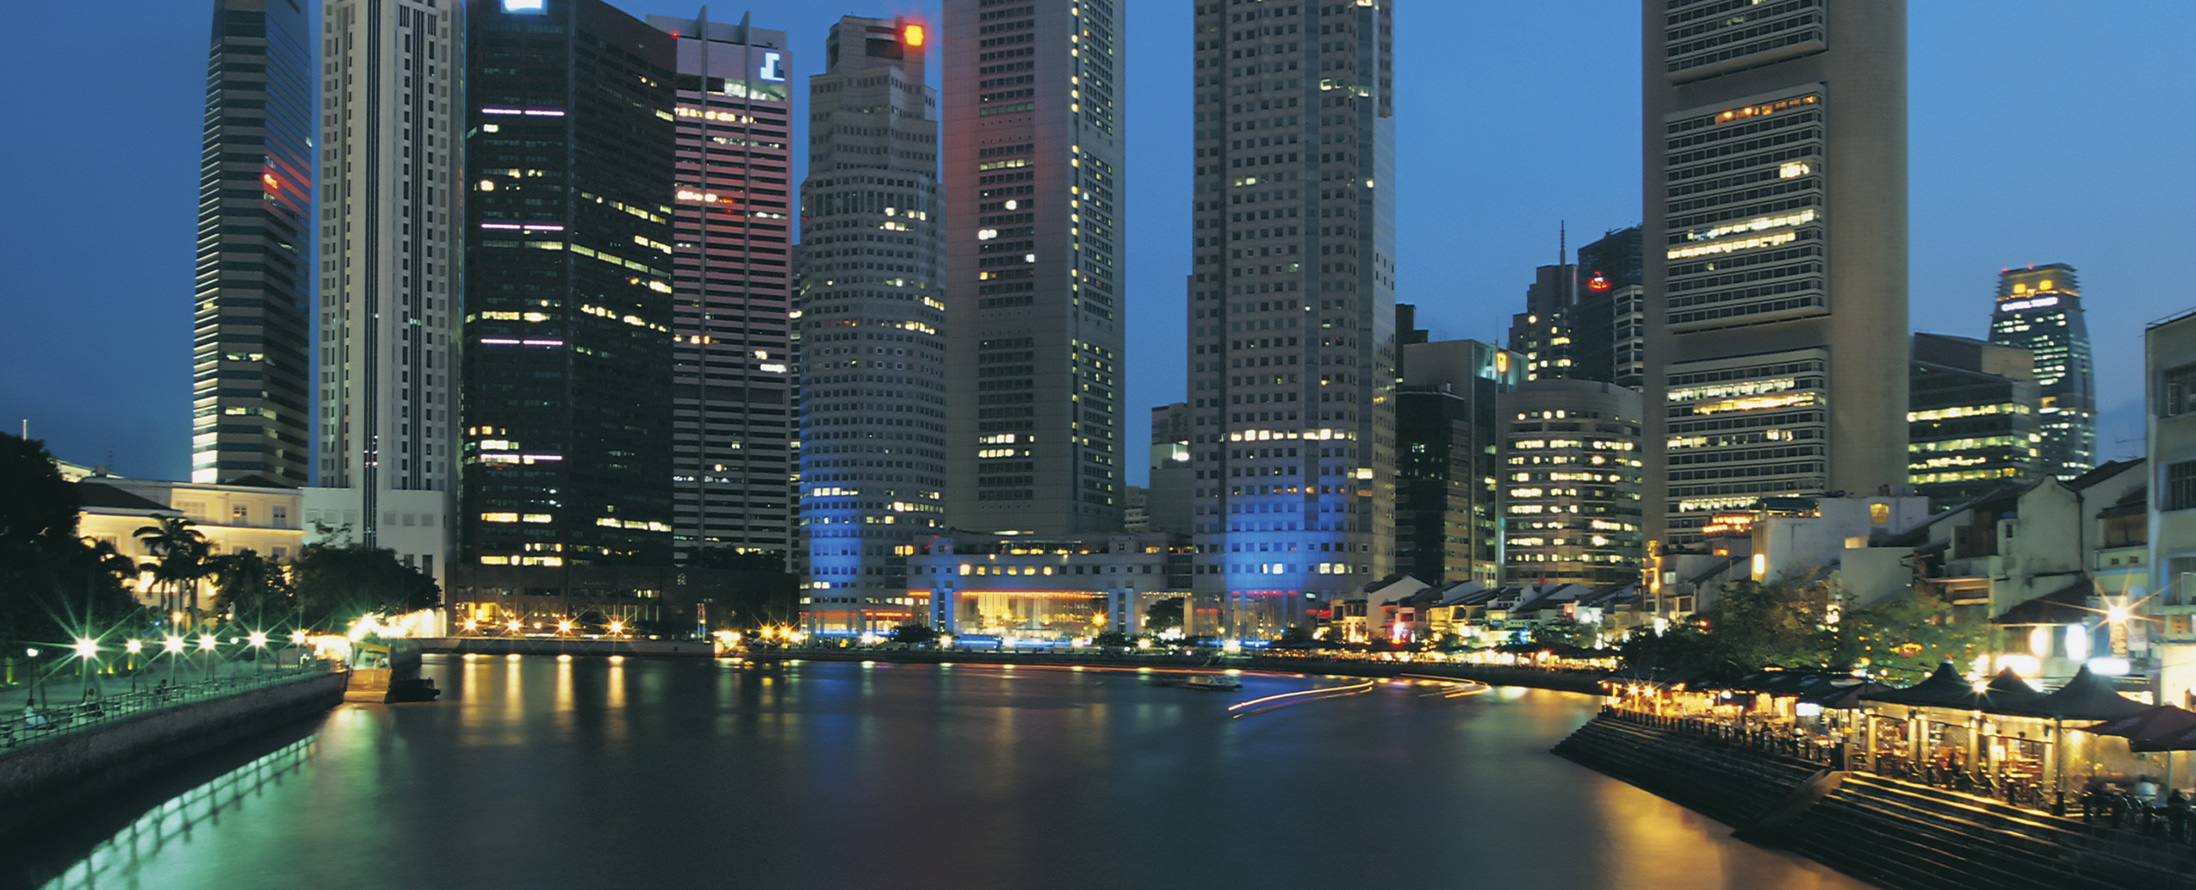 Fotolia_10923488_singapur_imageteam_5-1